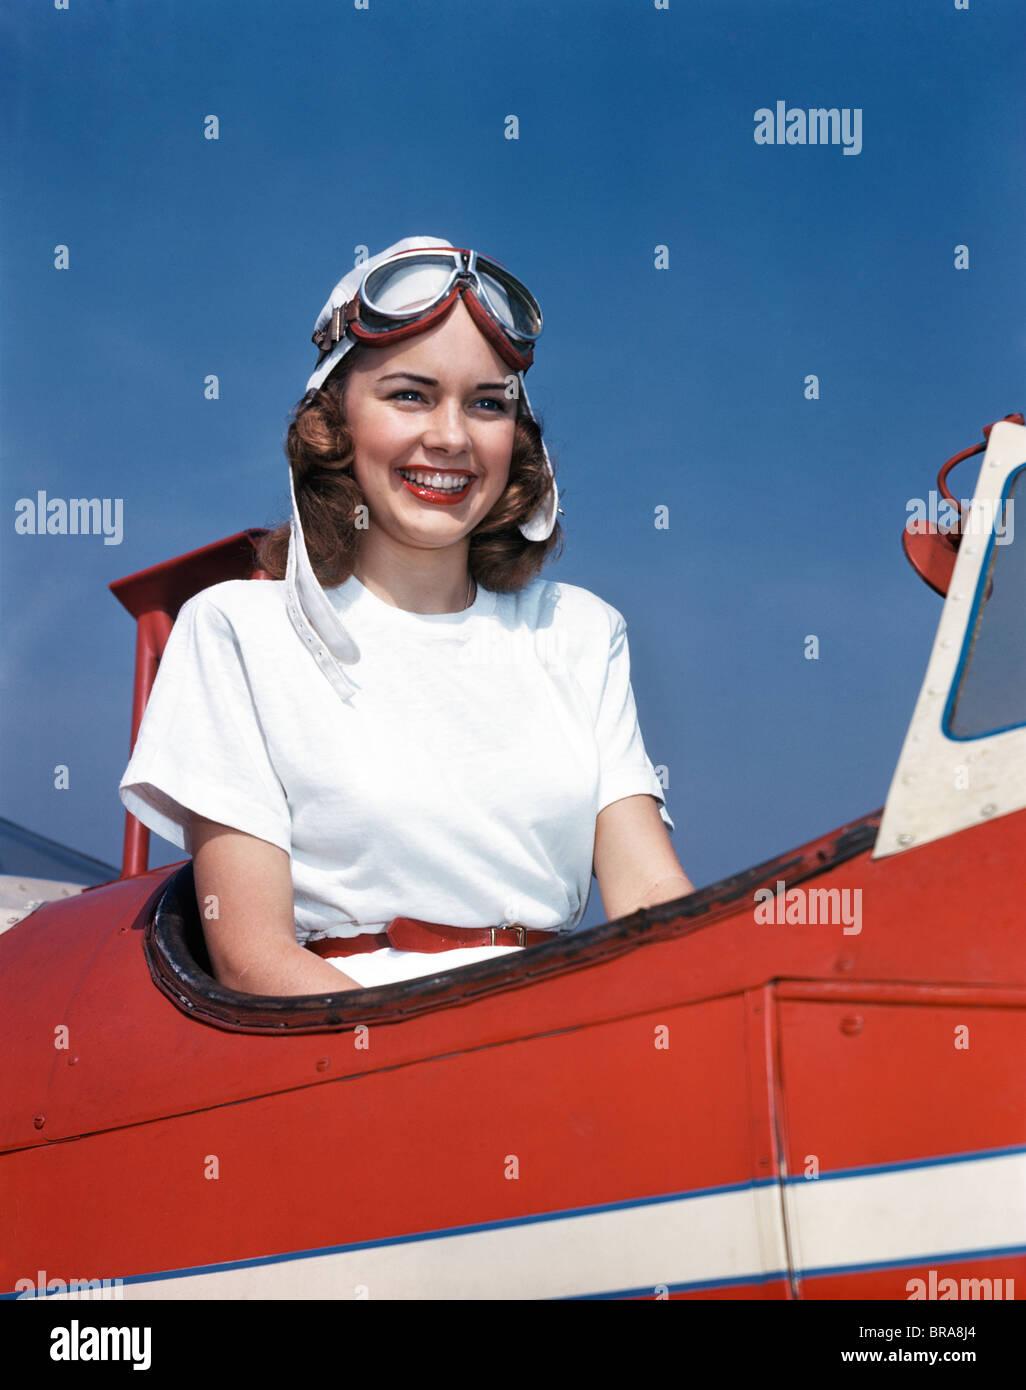 1940s 1950s Smiling Woman Wearing Pilots Helmet Goggles